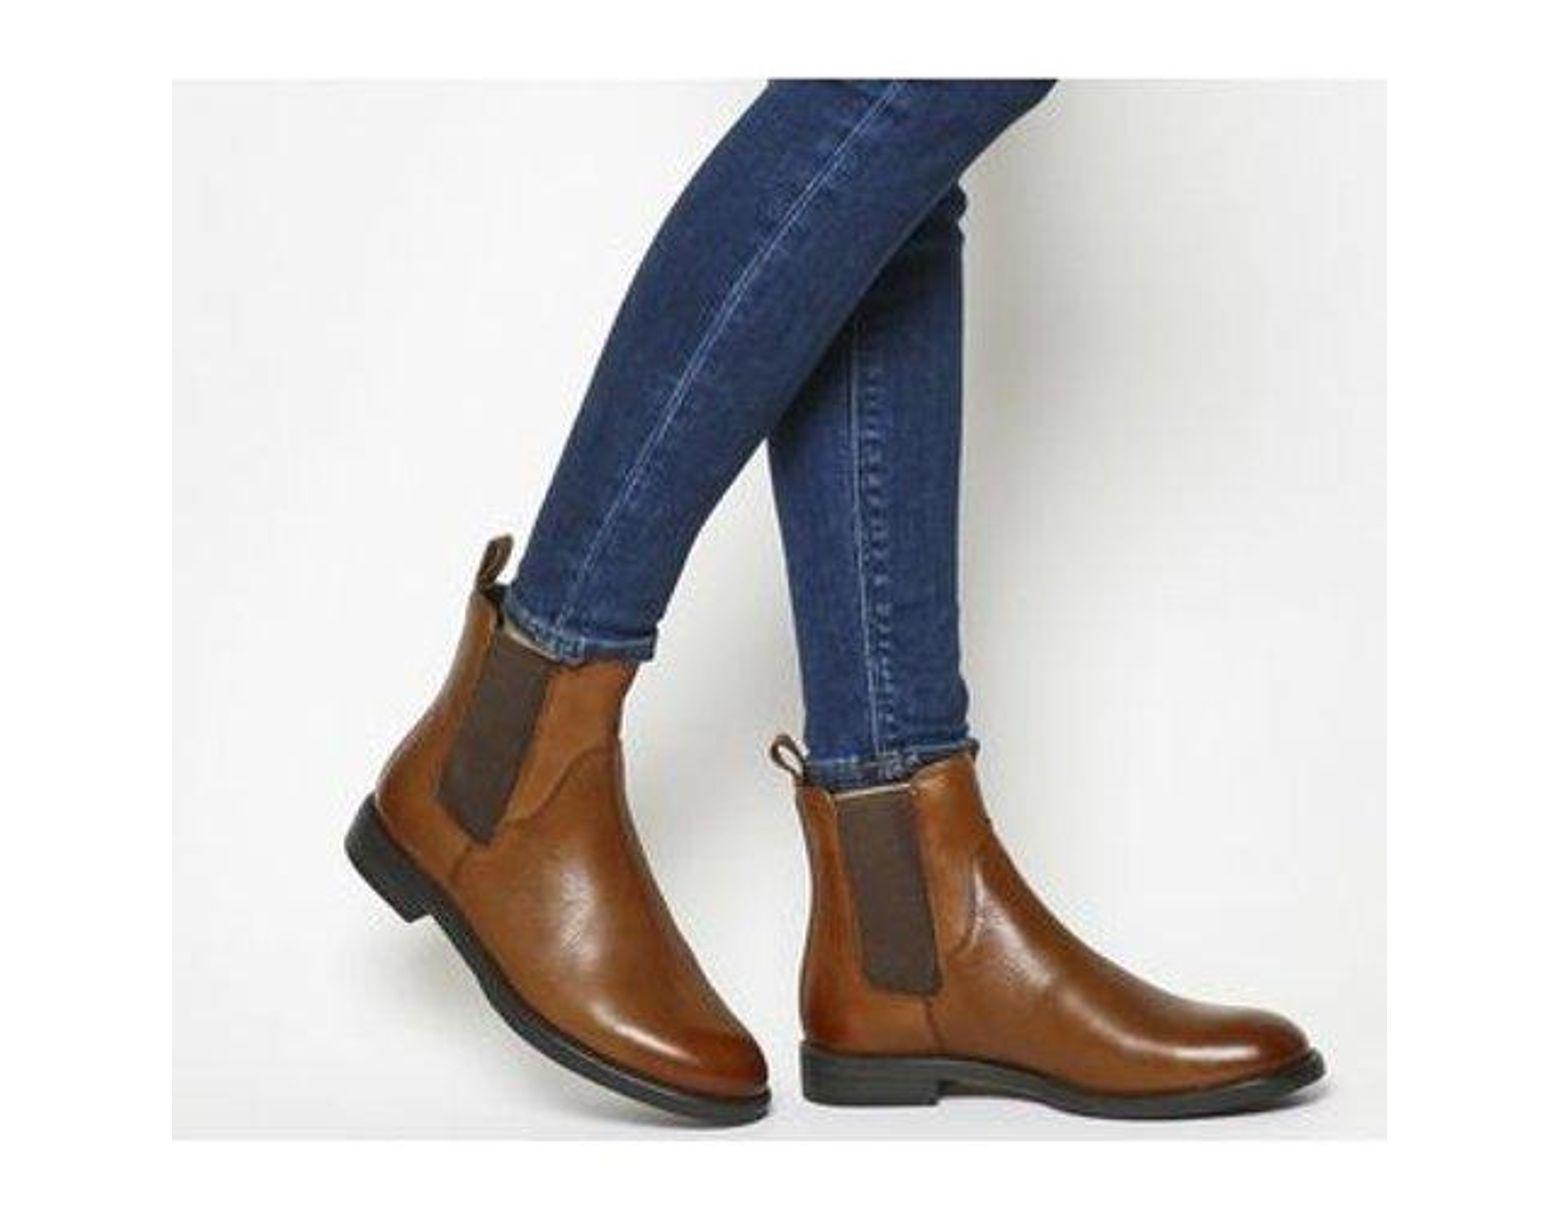 cf1e2c00d4a Vagabond Amina Chelsea Boot in Blue - Lyst